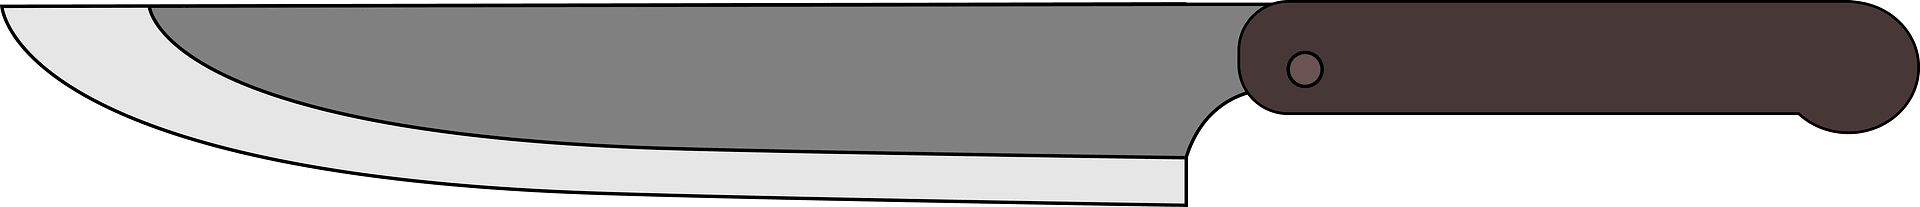 Knife clipart transparent 1